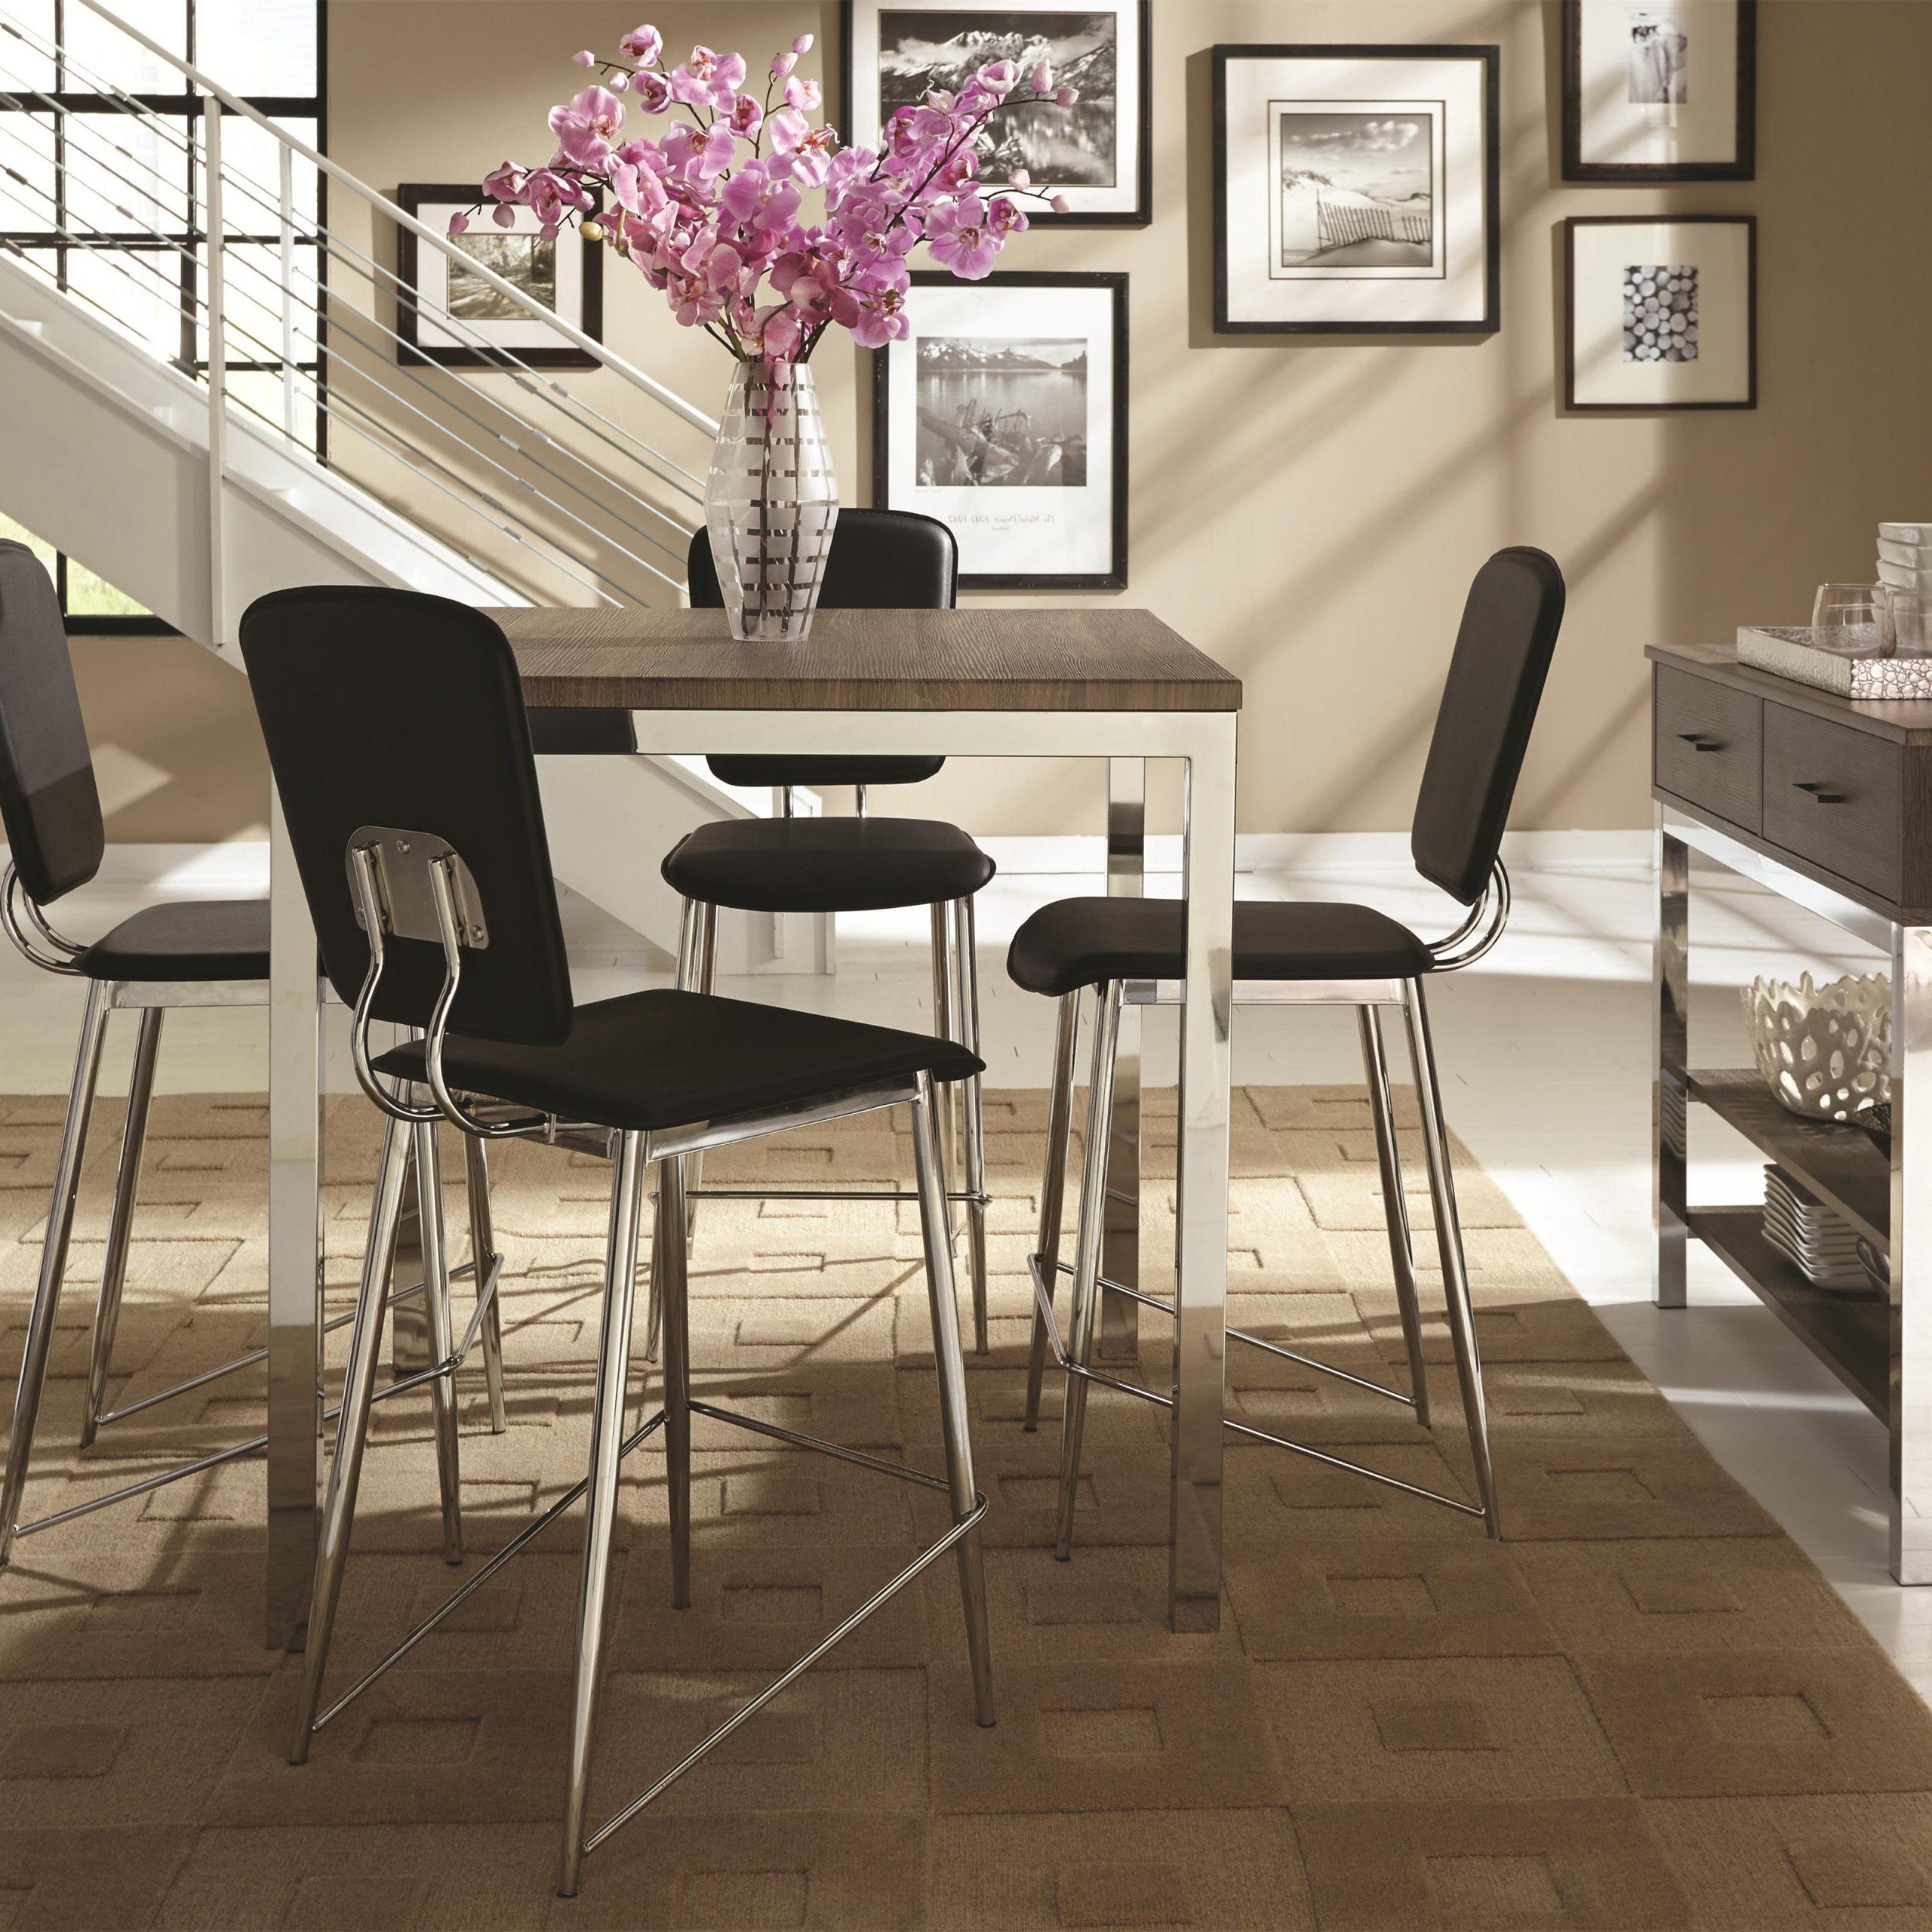 Current Eldridge (12) – Rotmans – Eldridge Dealer Pertaining To Chrome Contemporary Square Casual Dining Tables (View 11 of 30)